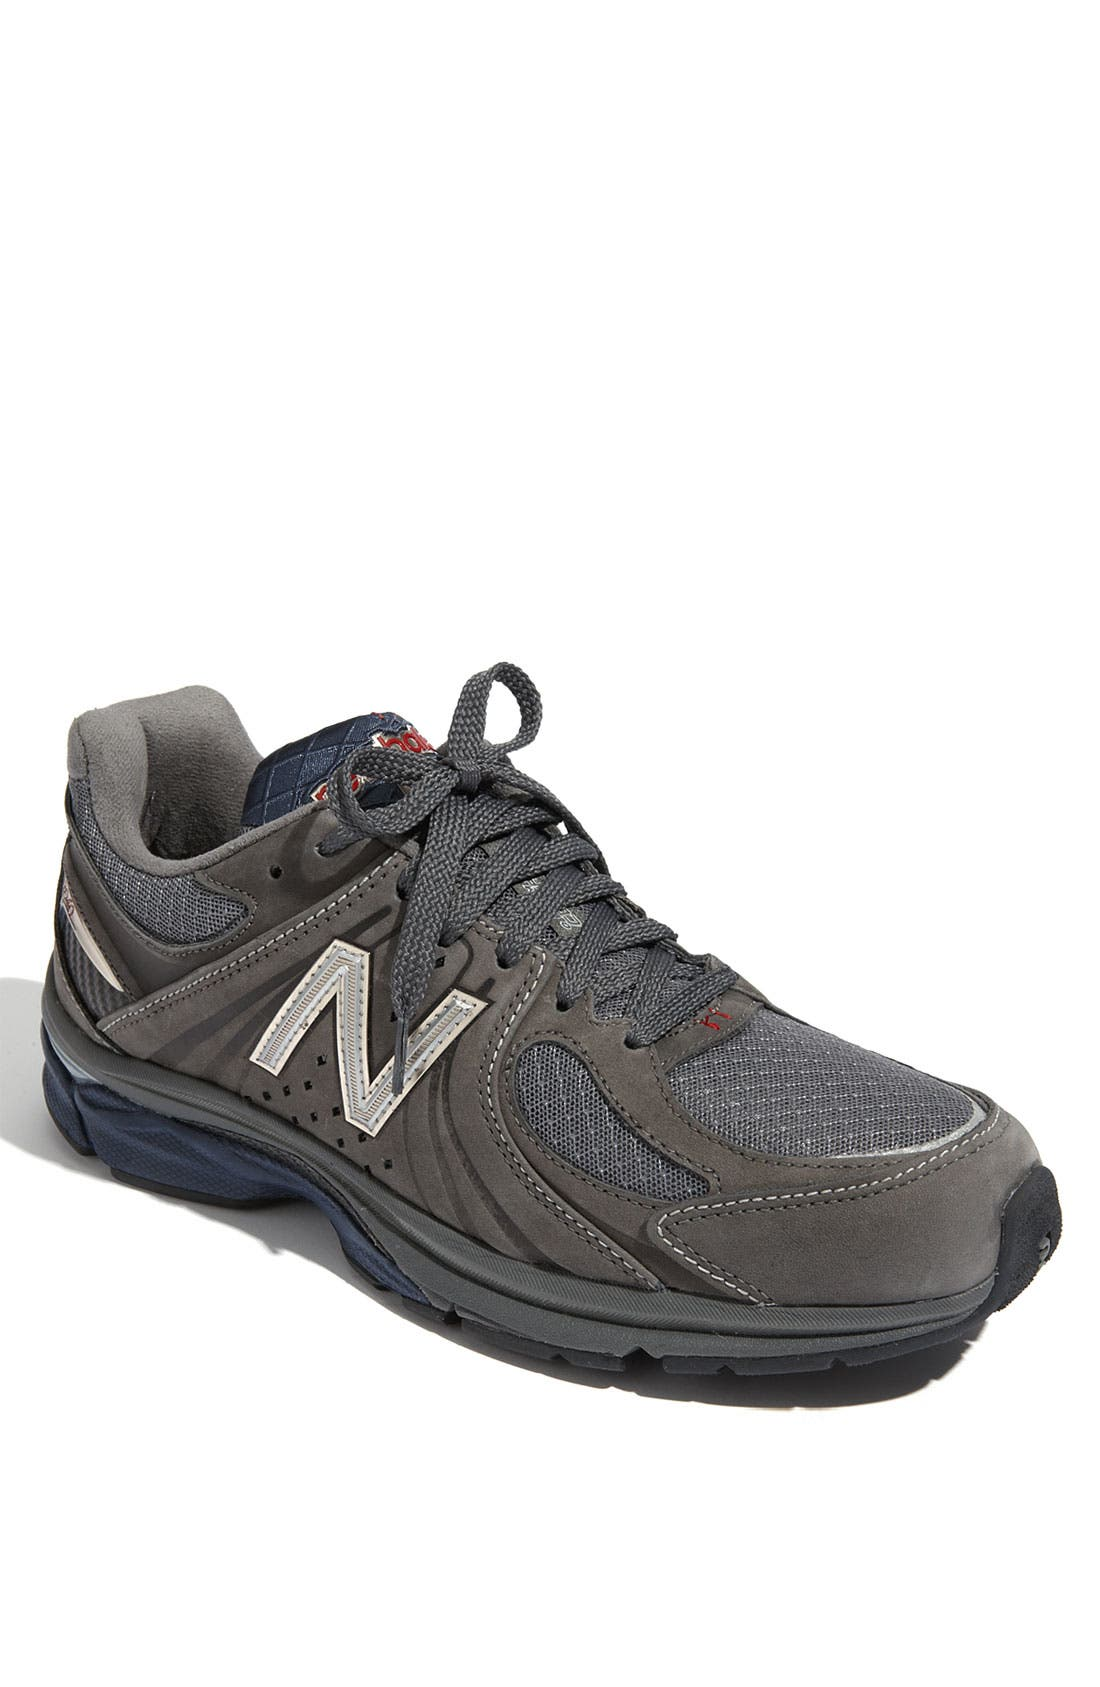 Main Image - New Balance 'Heritage Collection - 2040' Running Shoe (Men)